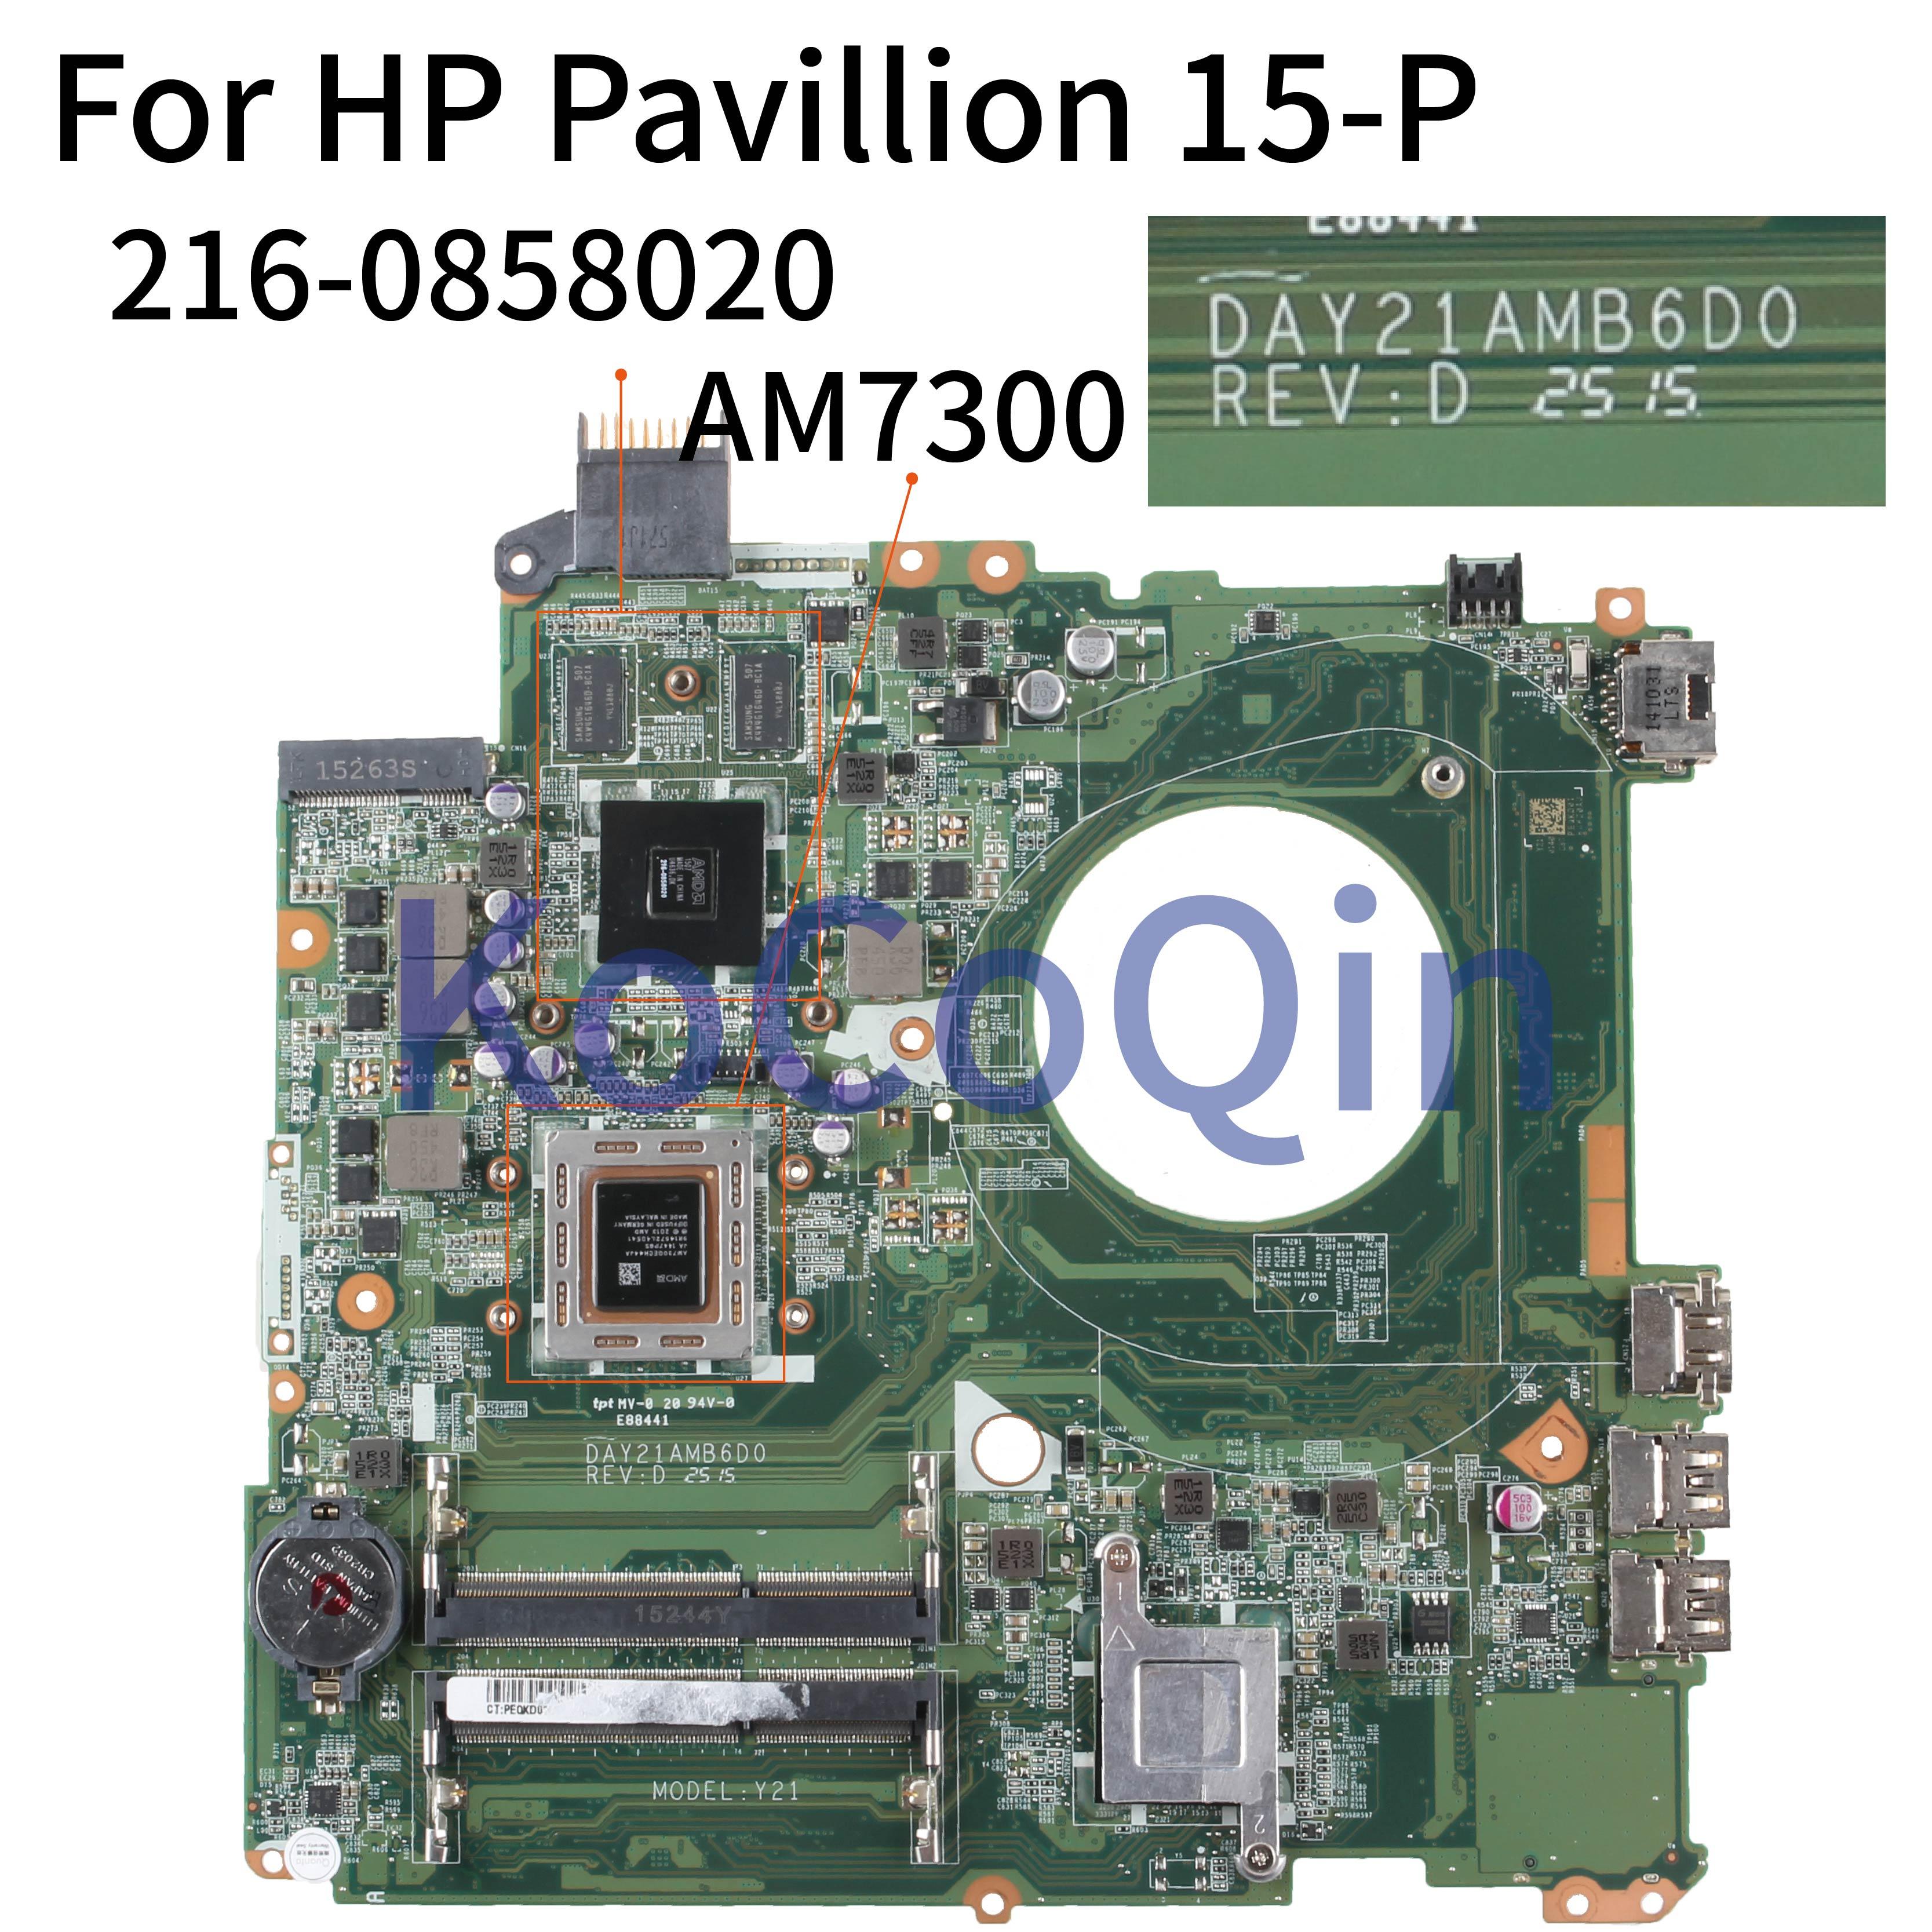 KoCoQin محمول لوحة رئيسية لأجهزة HP بافيليون 15-P 15